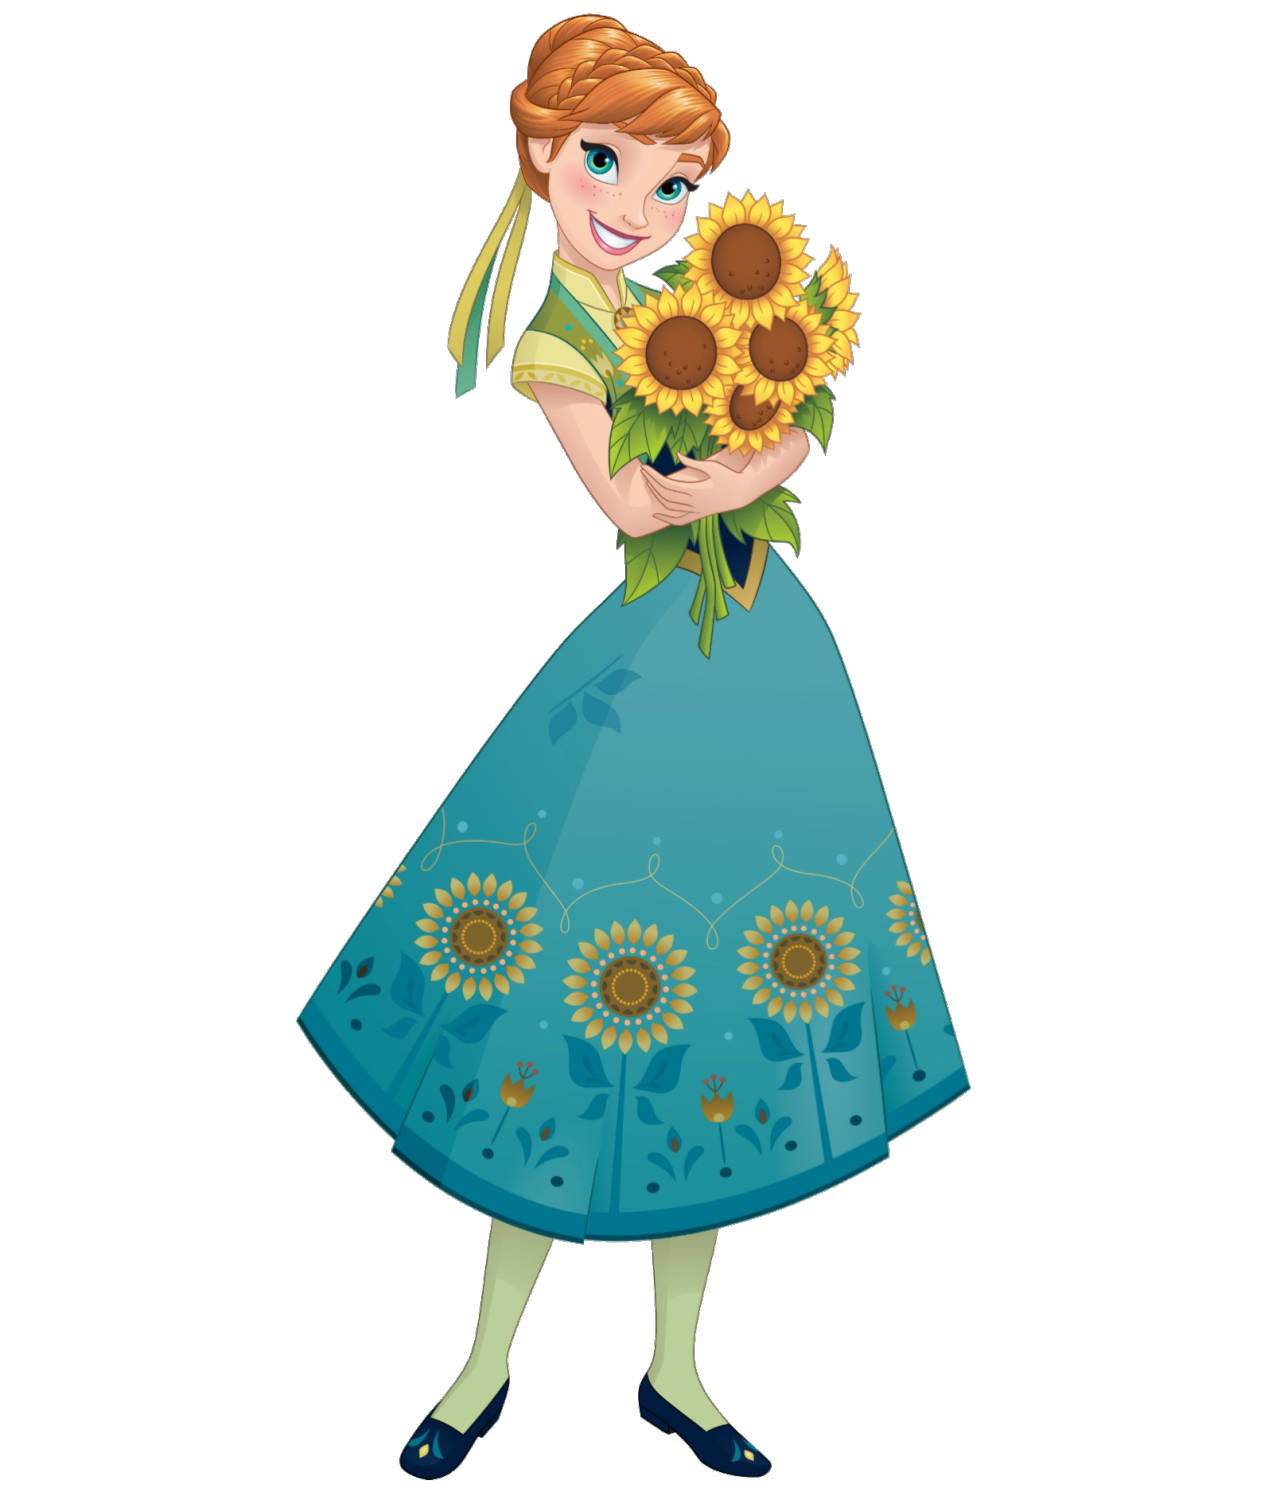 Elsa clipart king costume. Image anna frozen fever